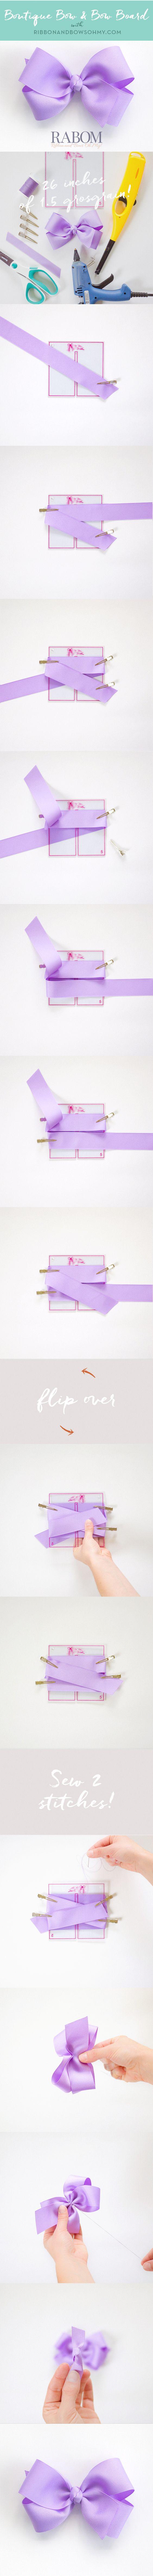 Boutique Bow Quick Tutorial with RABOM! ribbonandbowsohmy.com